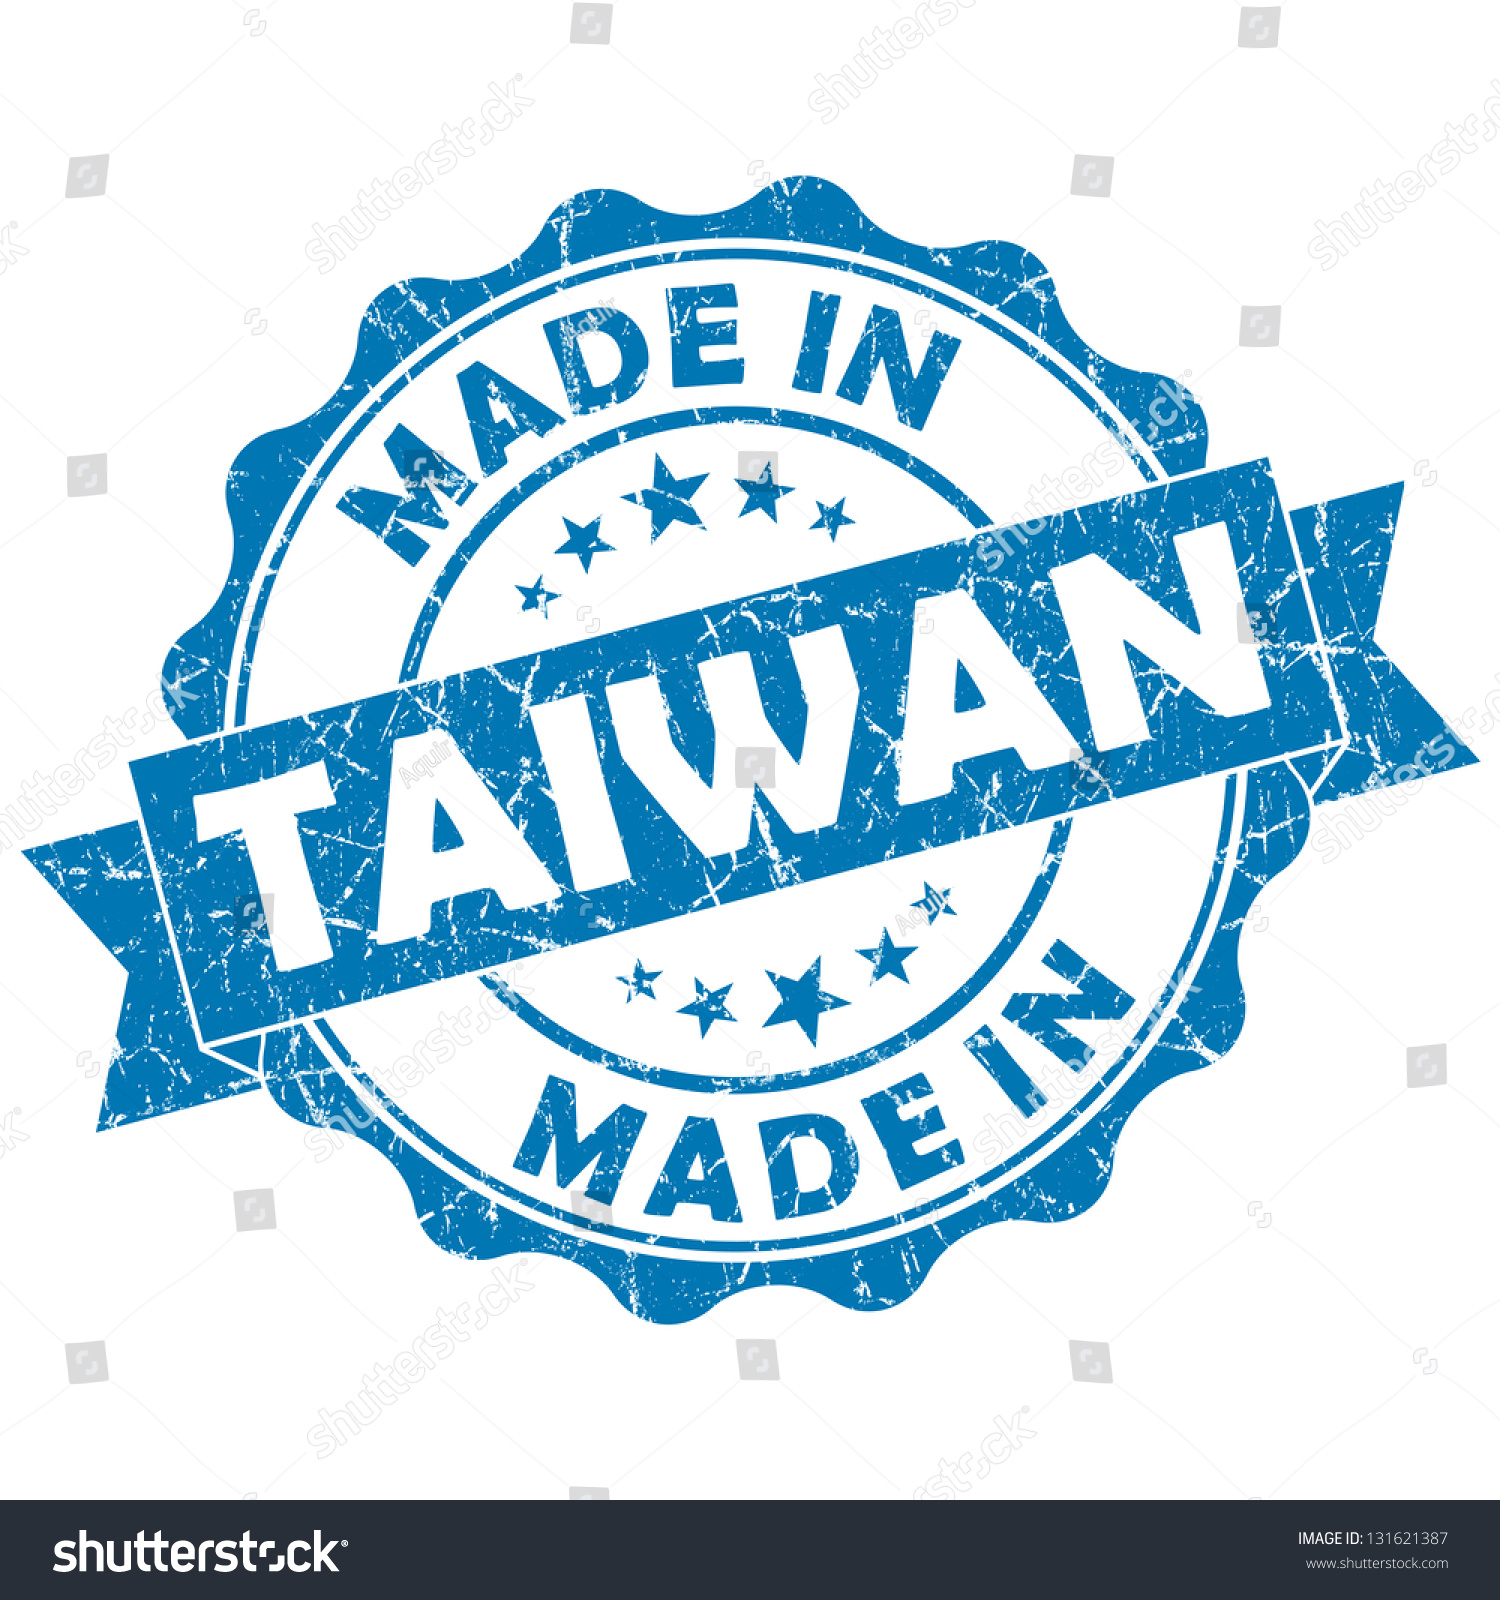 Made Taiwan Stamp Stock Illustration 131621387 Shutterstock